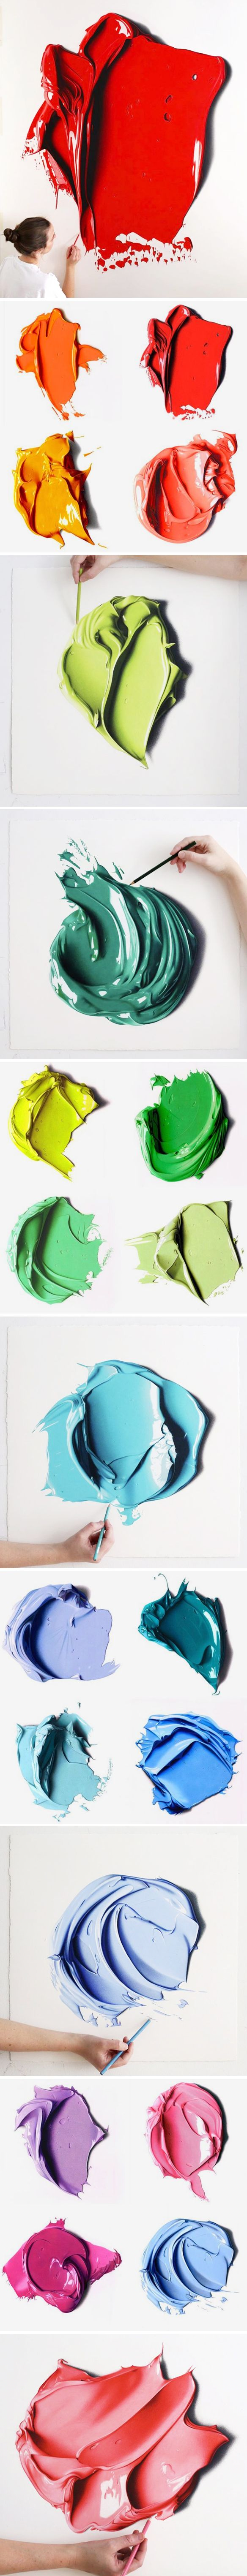 DRAWINGS (!?) ... color pencil drawings by cj hendry